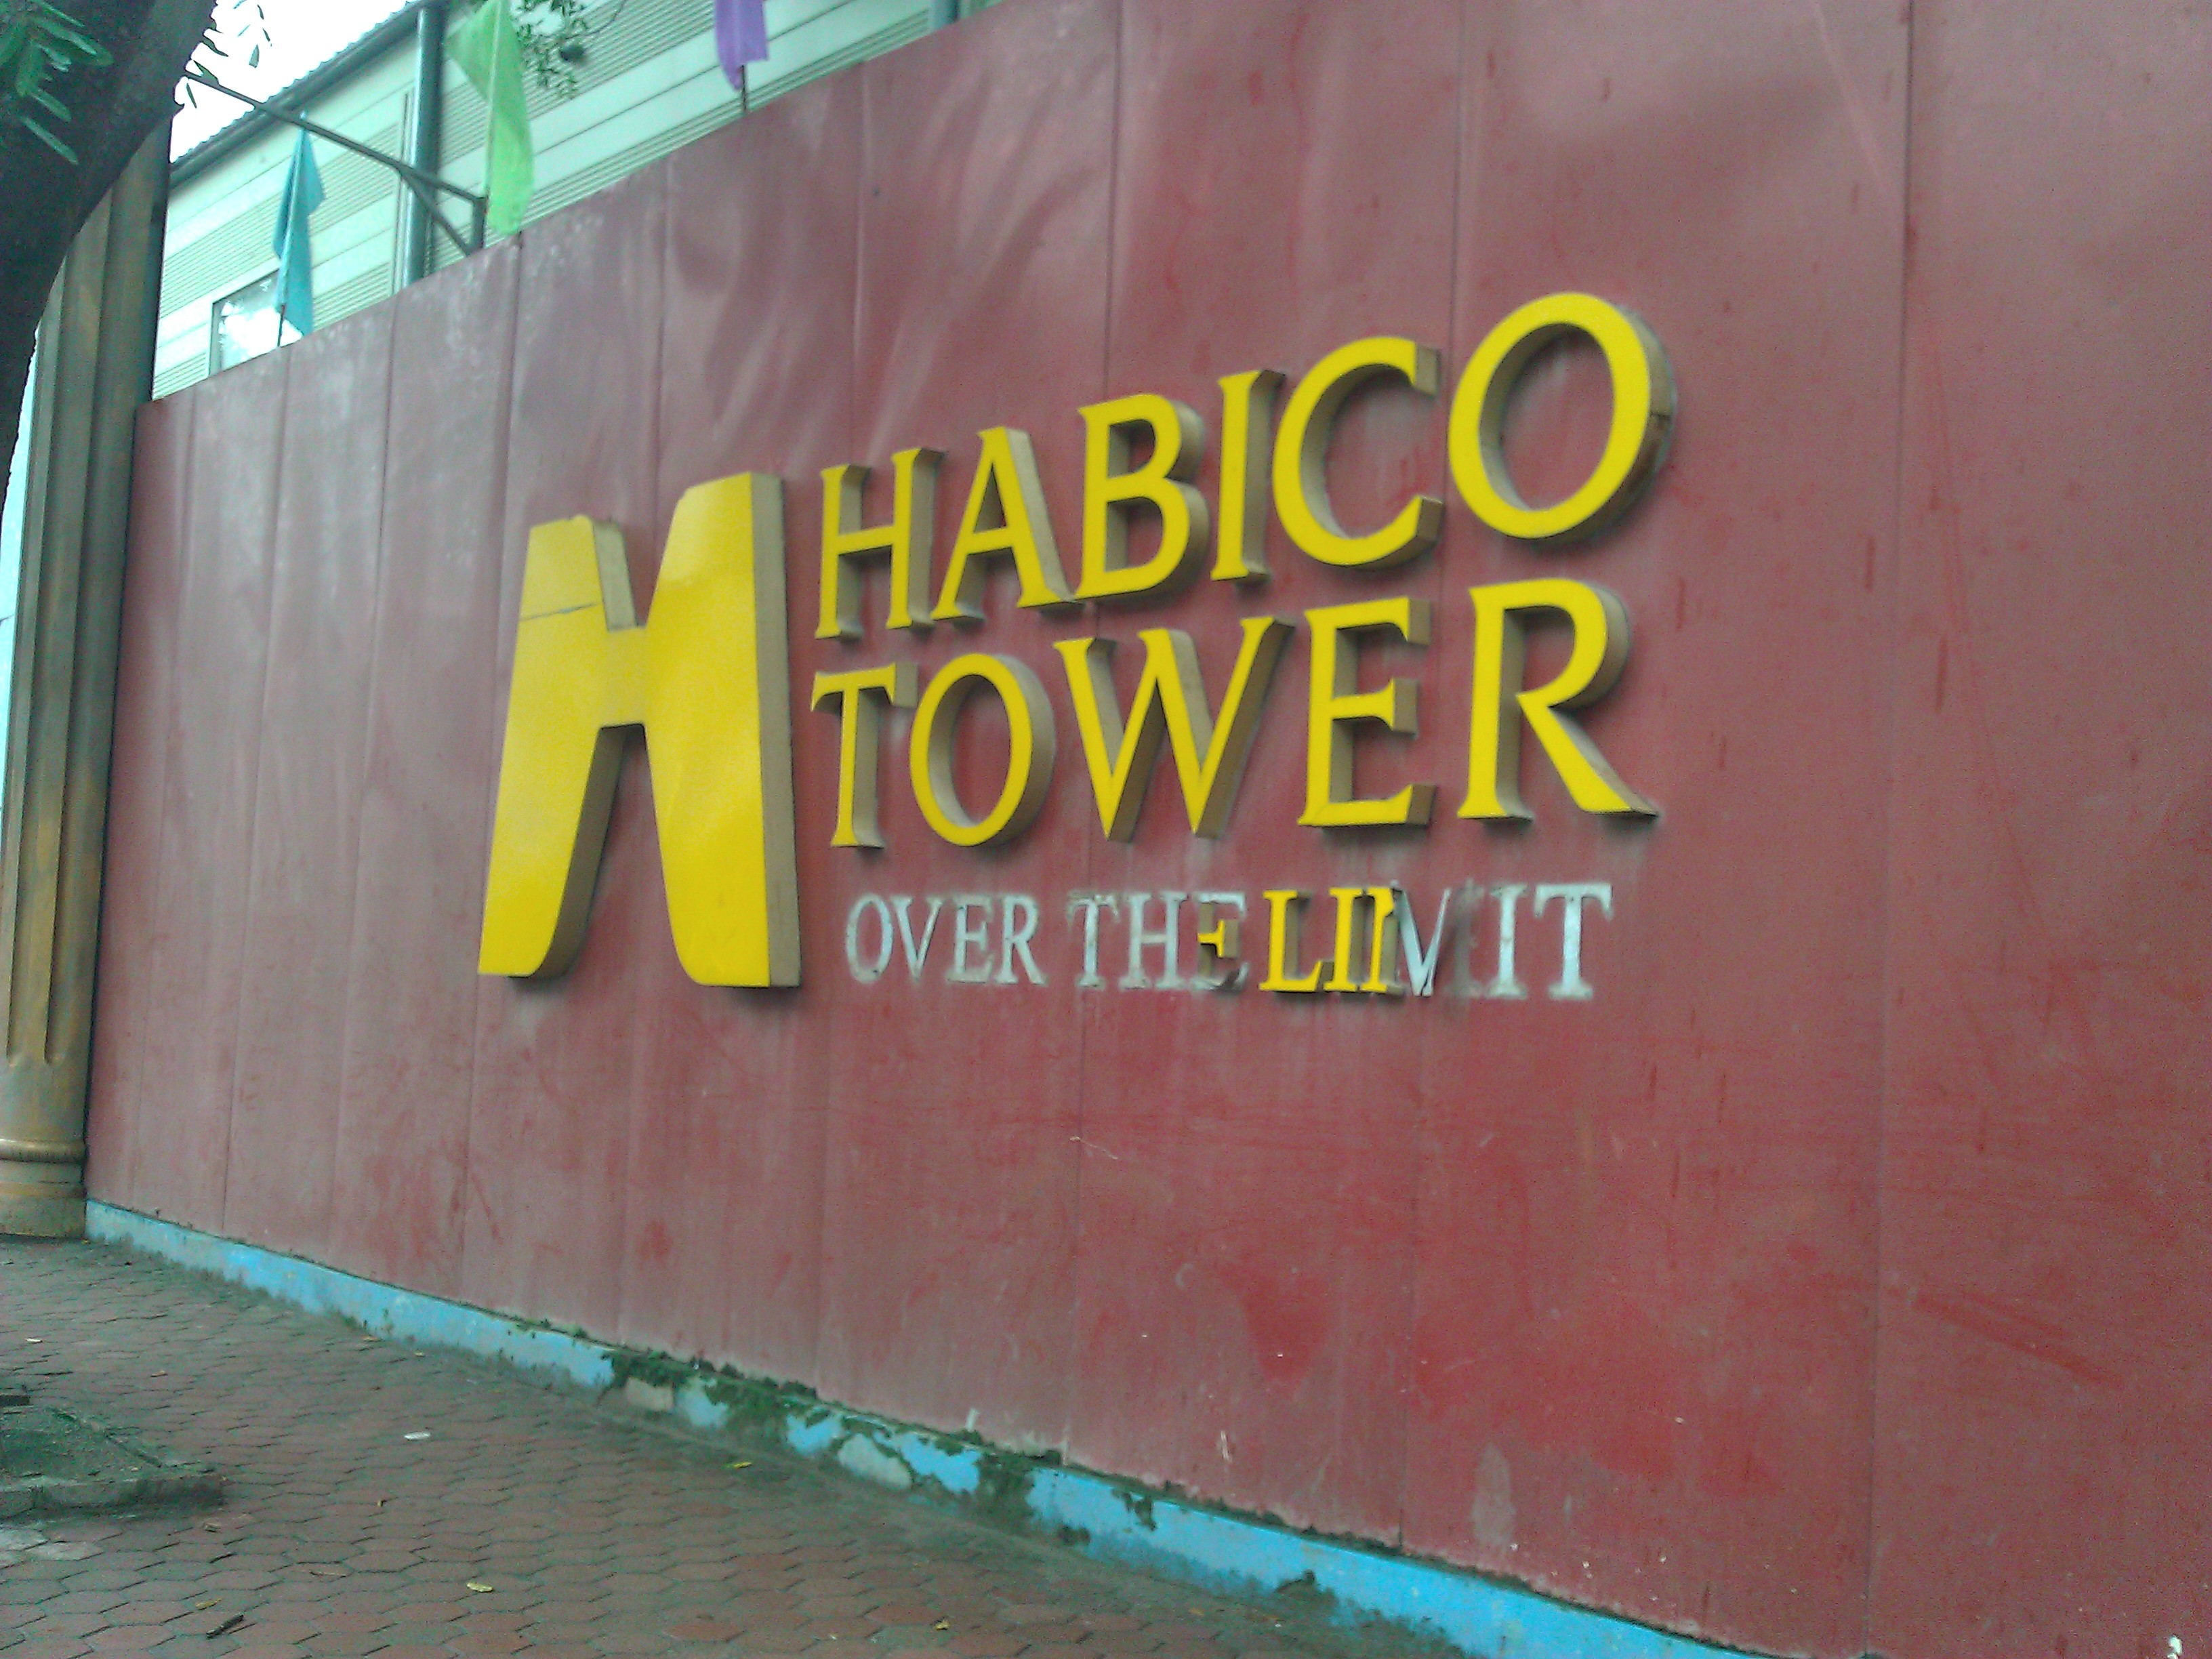 Habico Tower